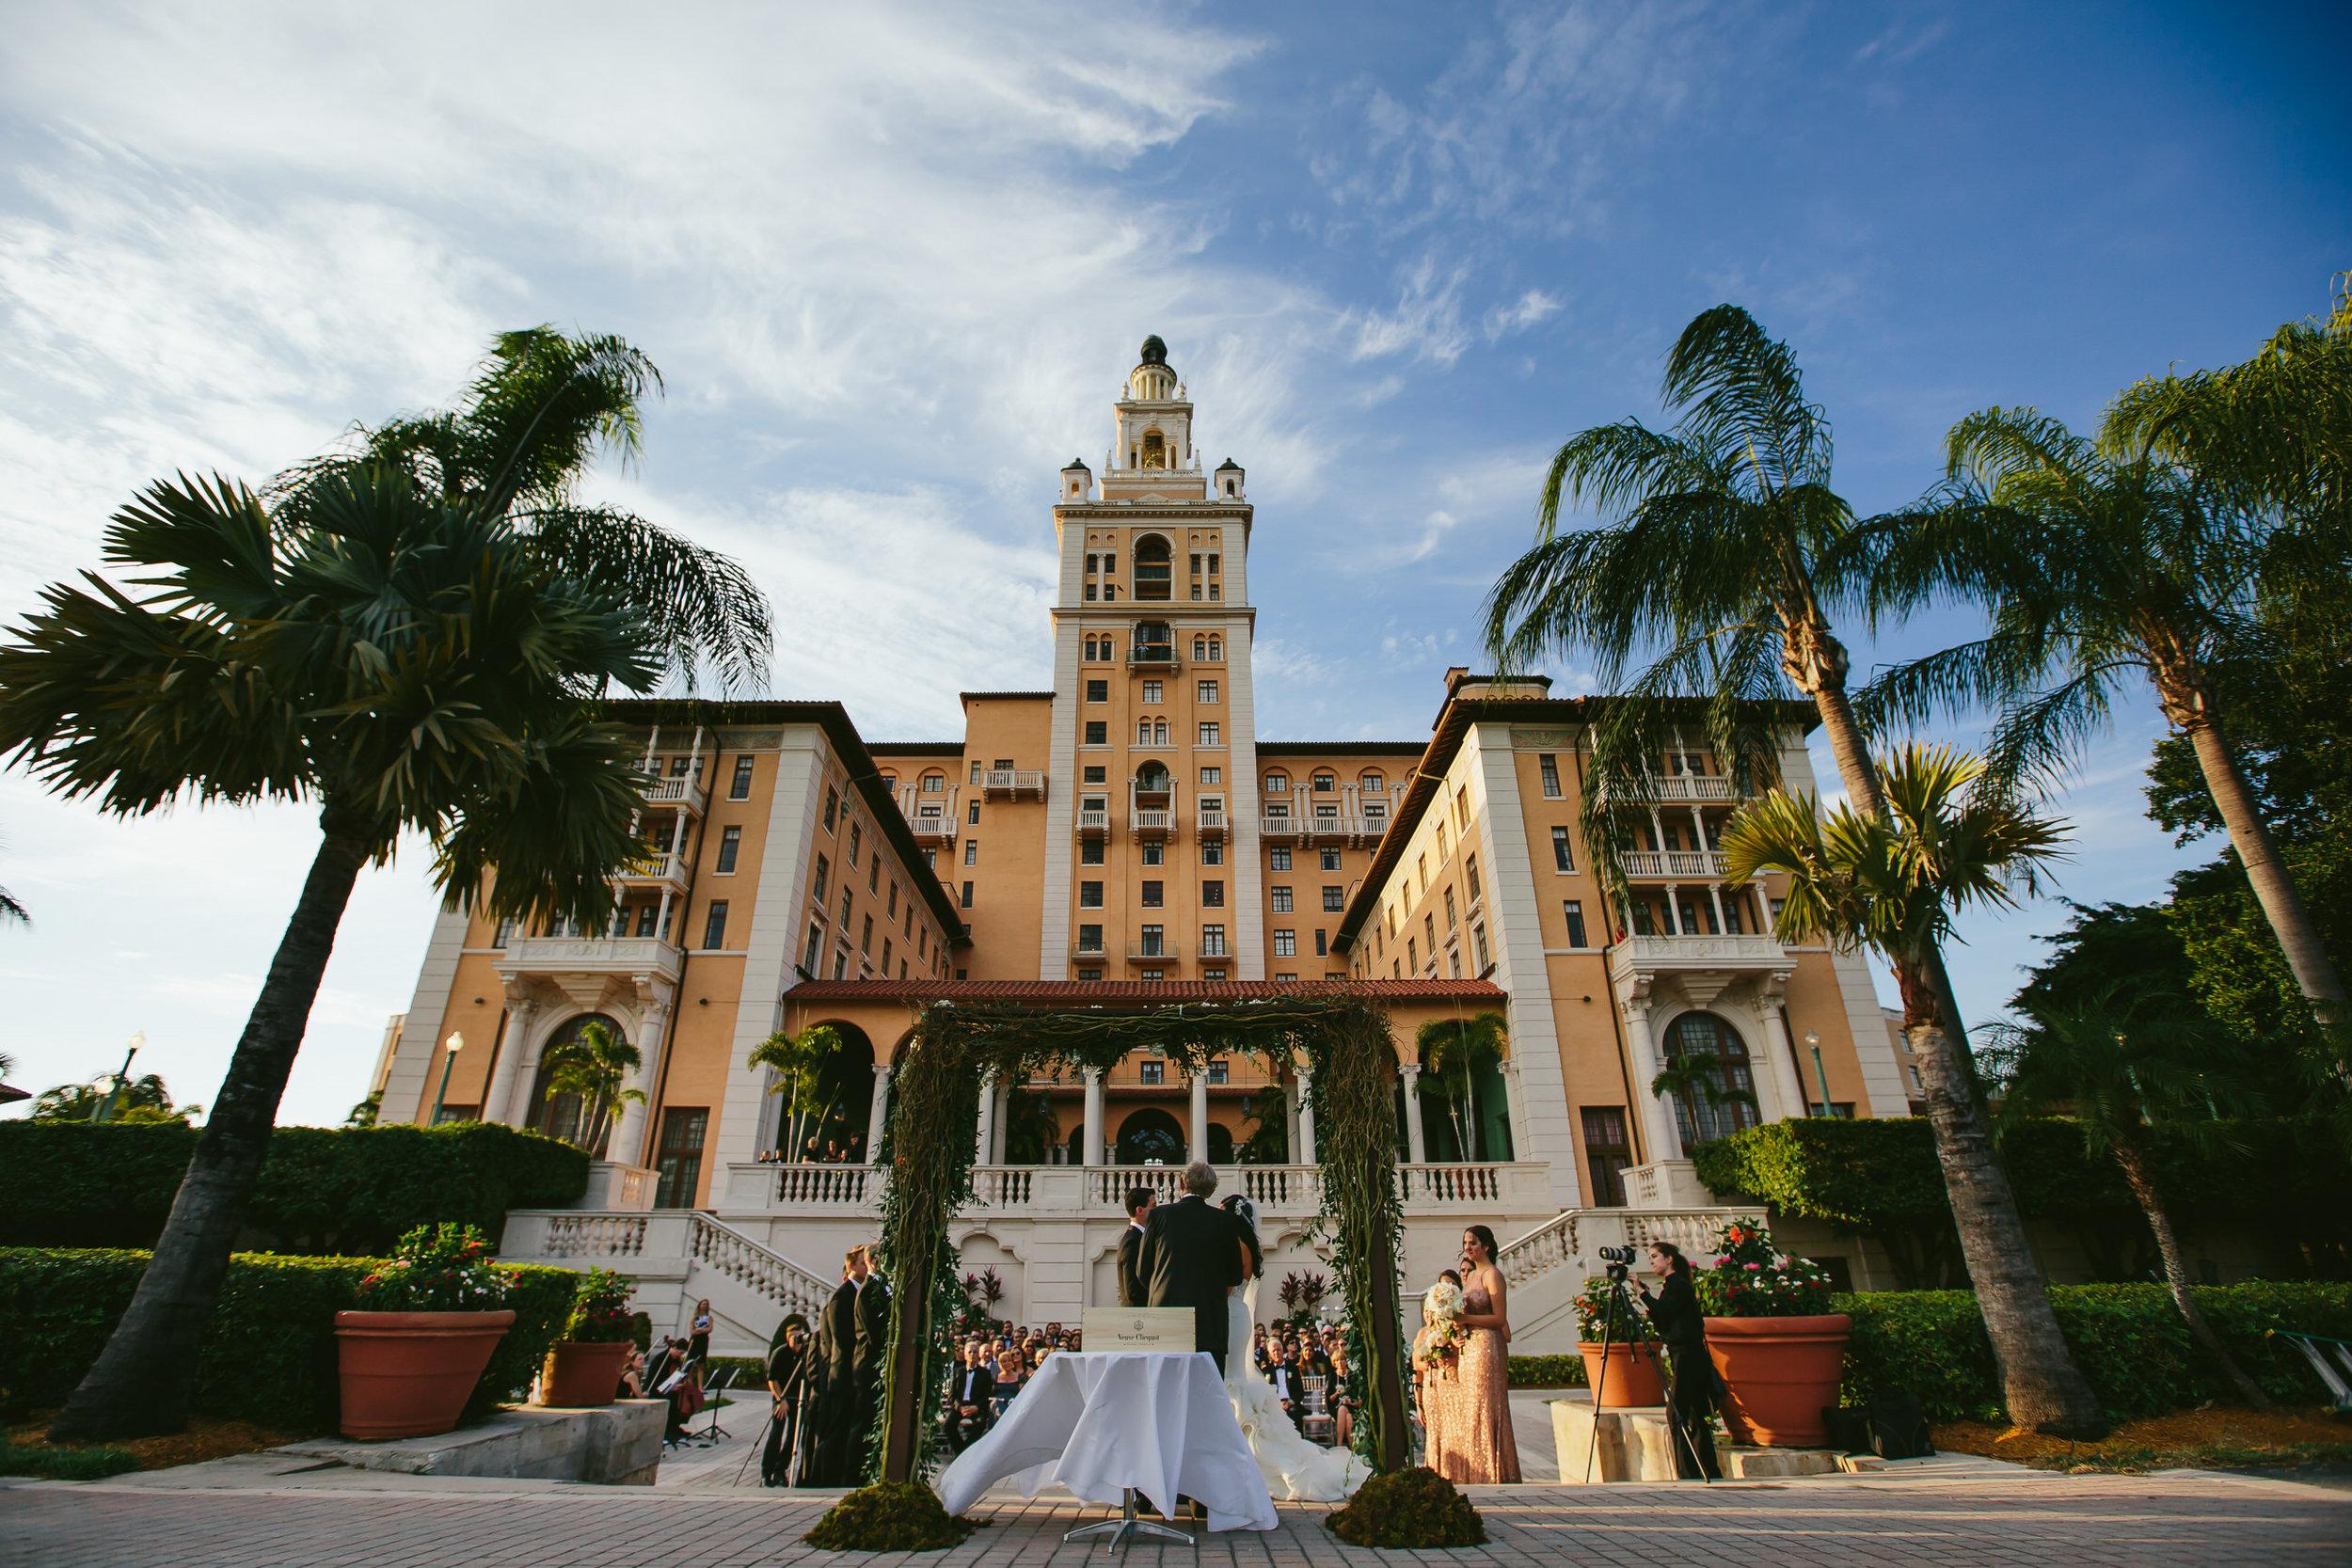 miami-biltmore-wedding-photographer-ceremony-steph-lynn-photo-31.jpg